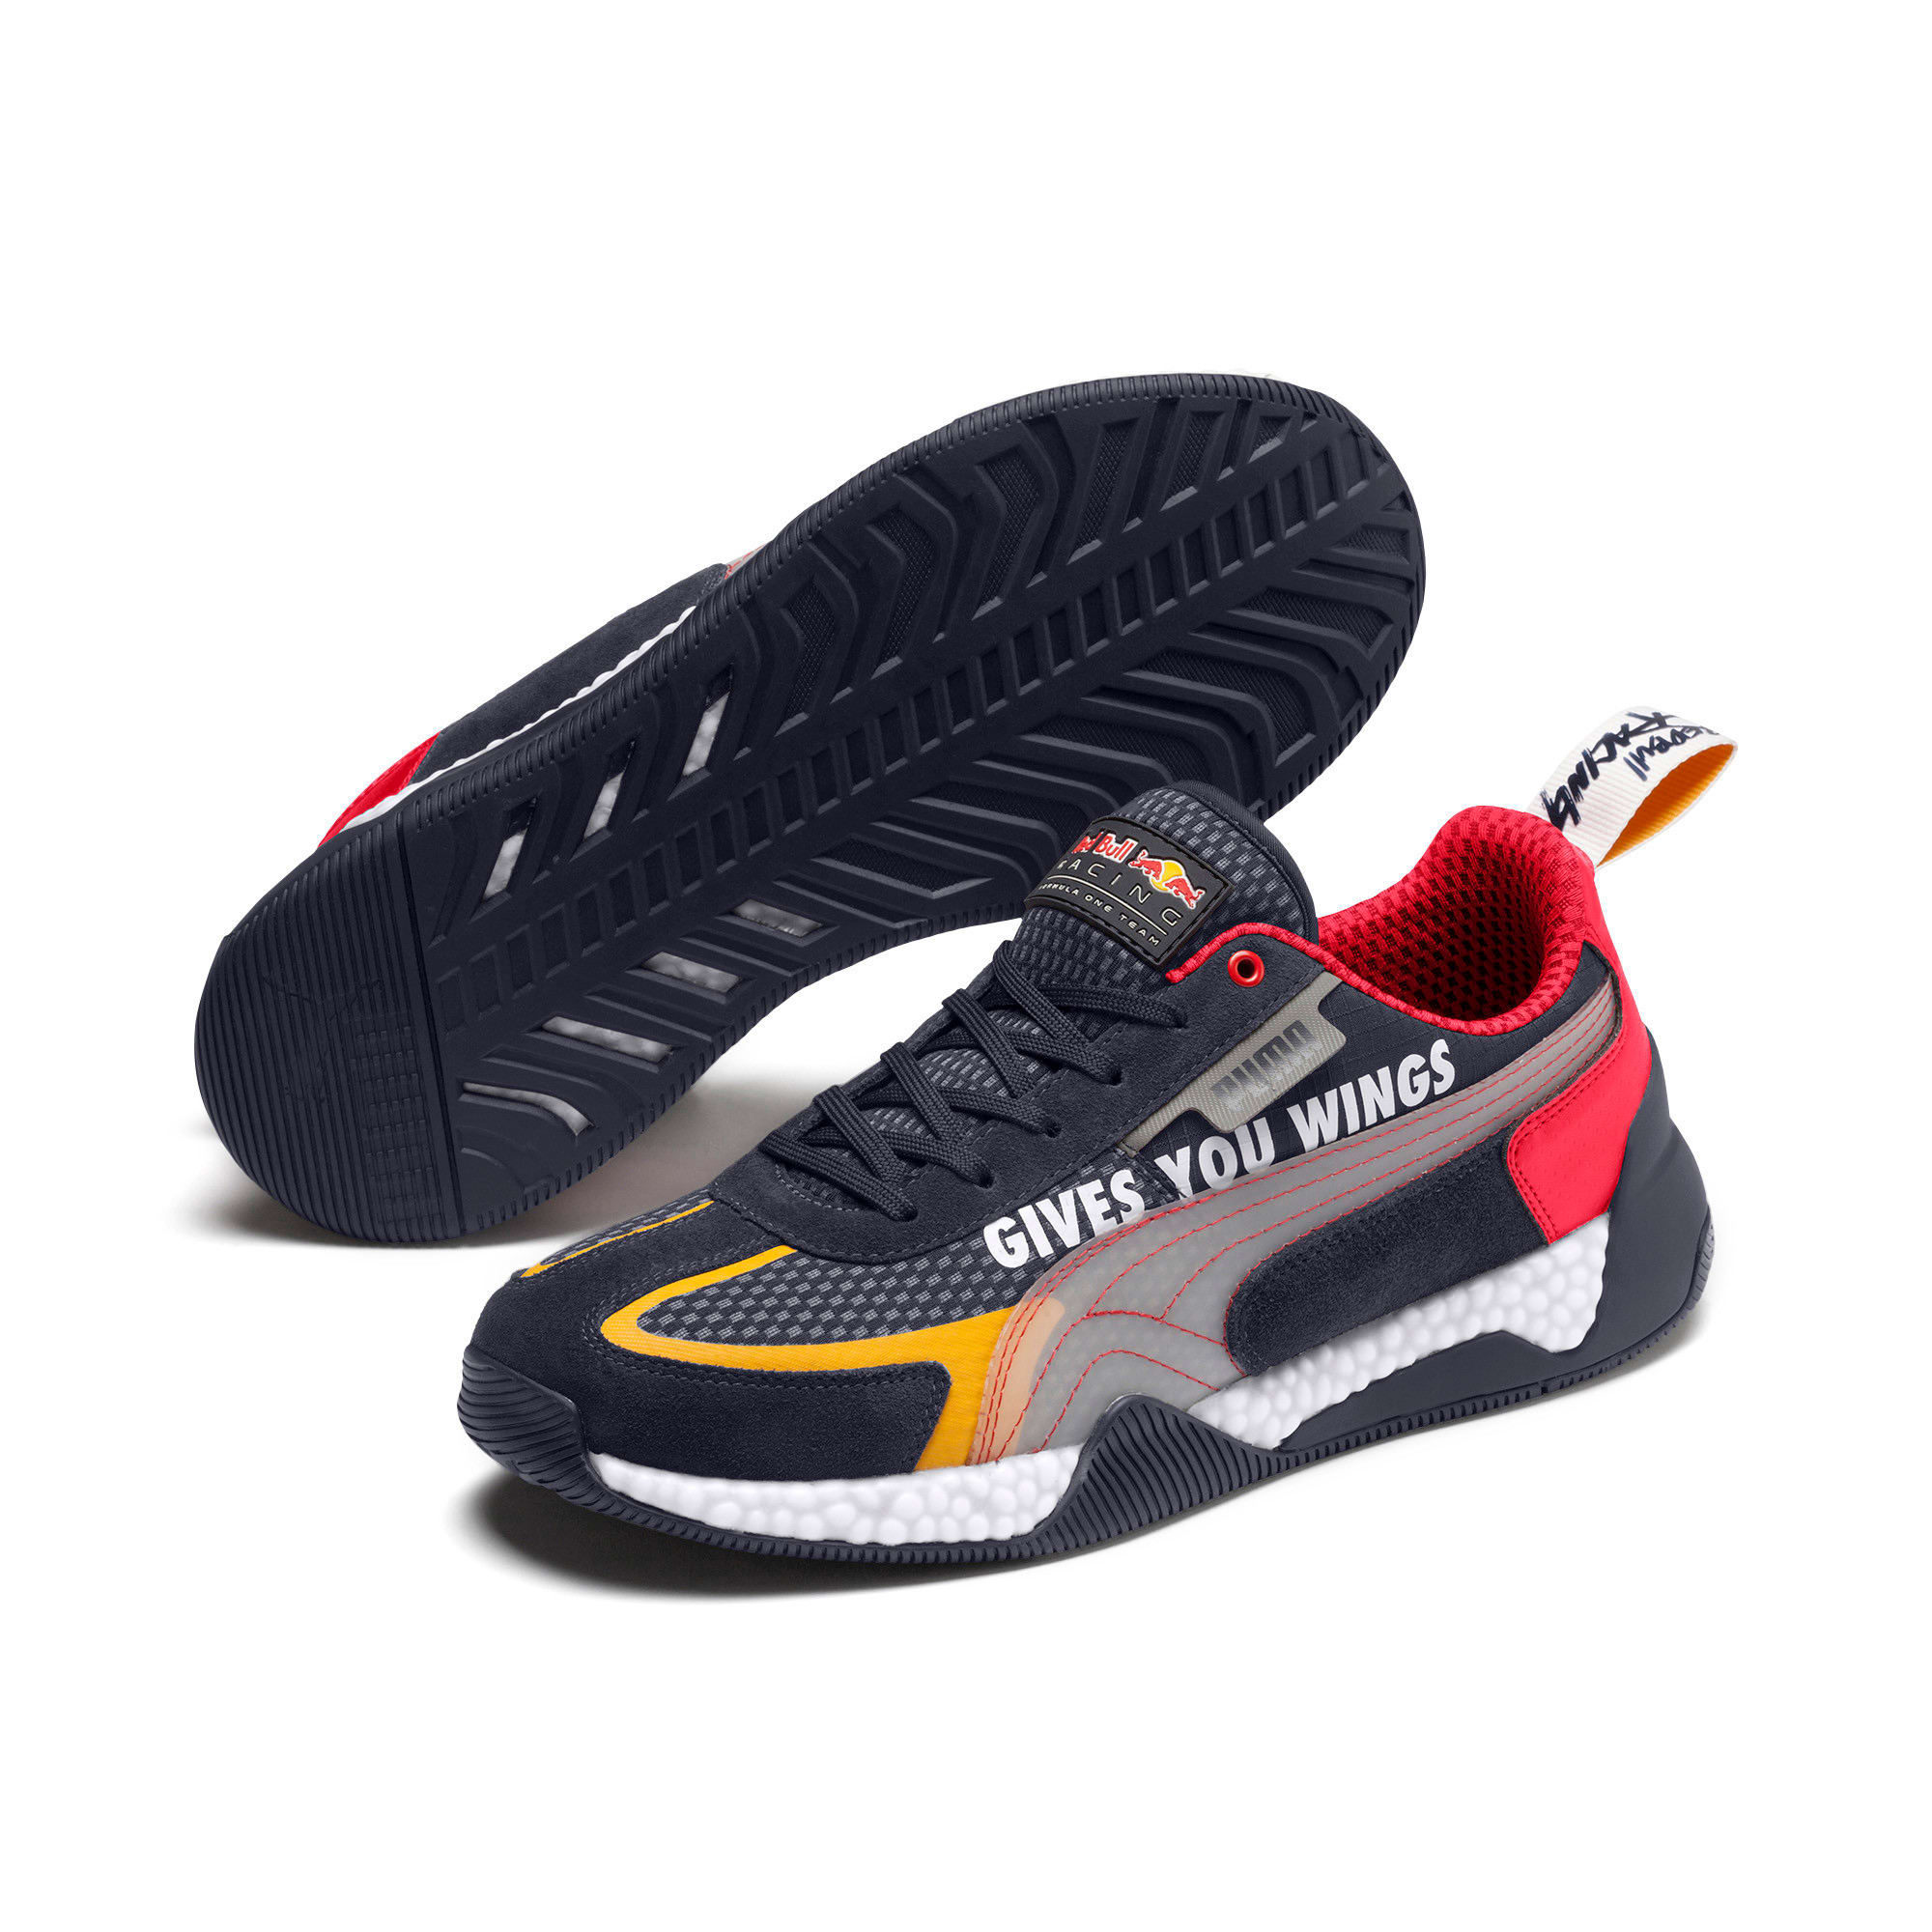 Thumbnail 3 of Red Bull Racing Speed HYBRID sneakers voor heren, NIGHT SKY-White-Chinese Red, medium